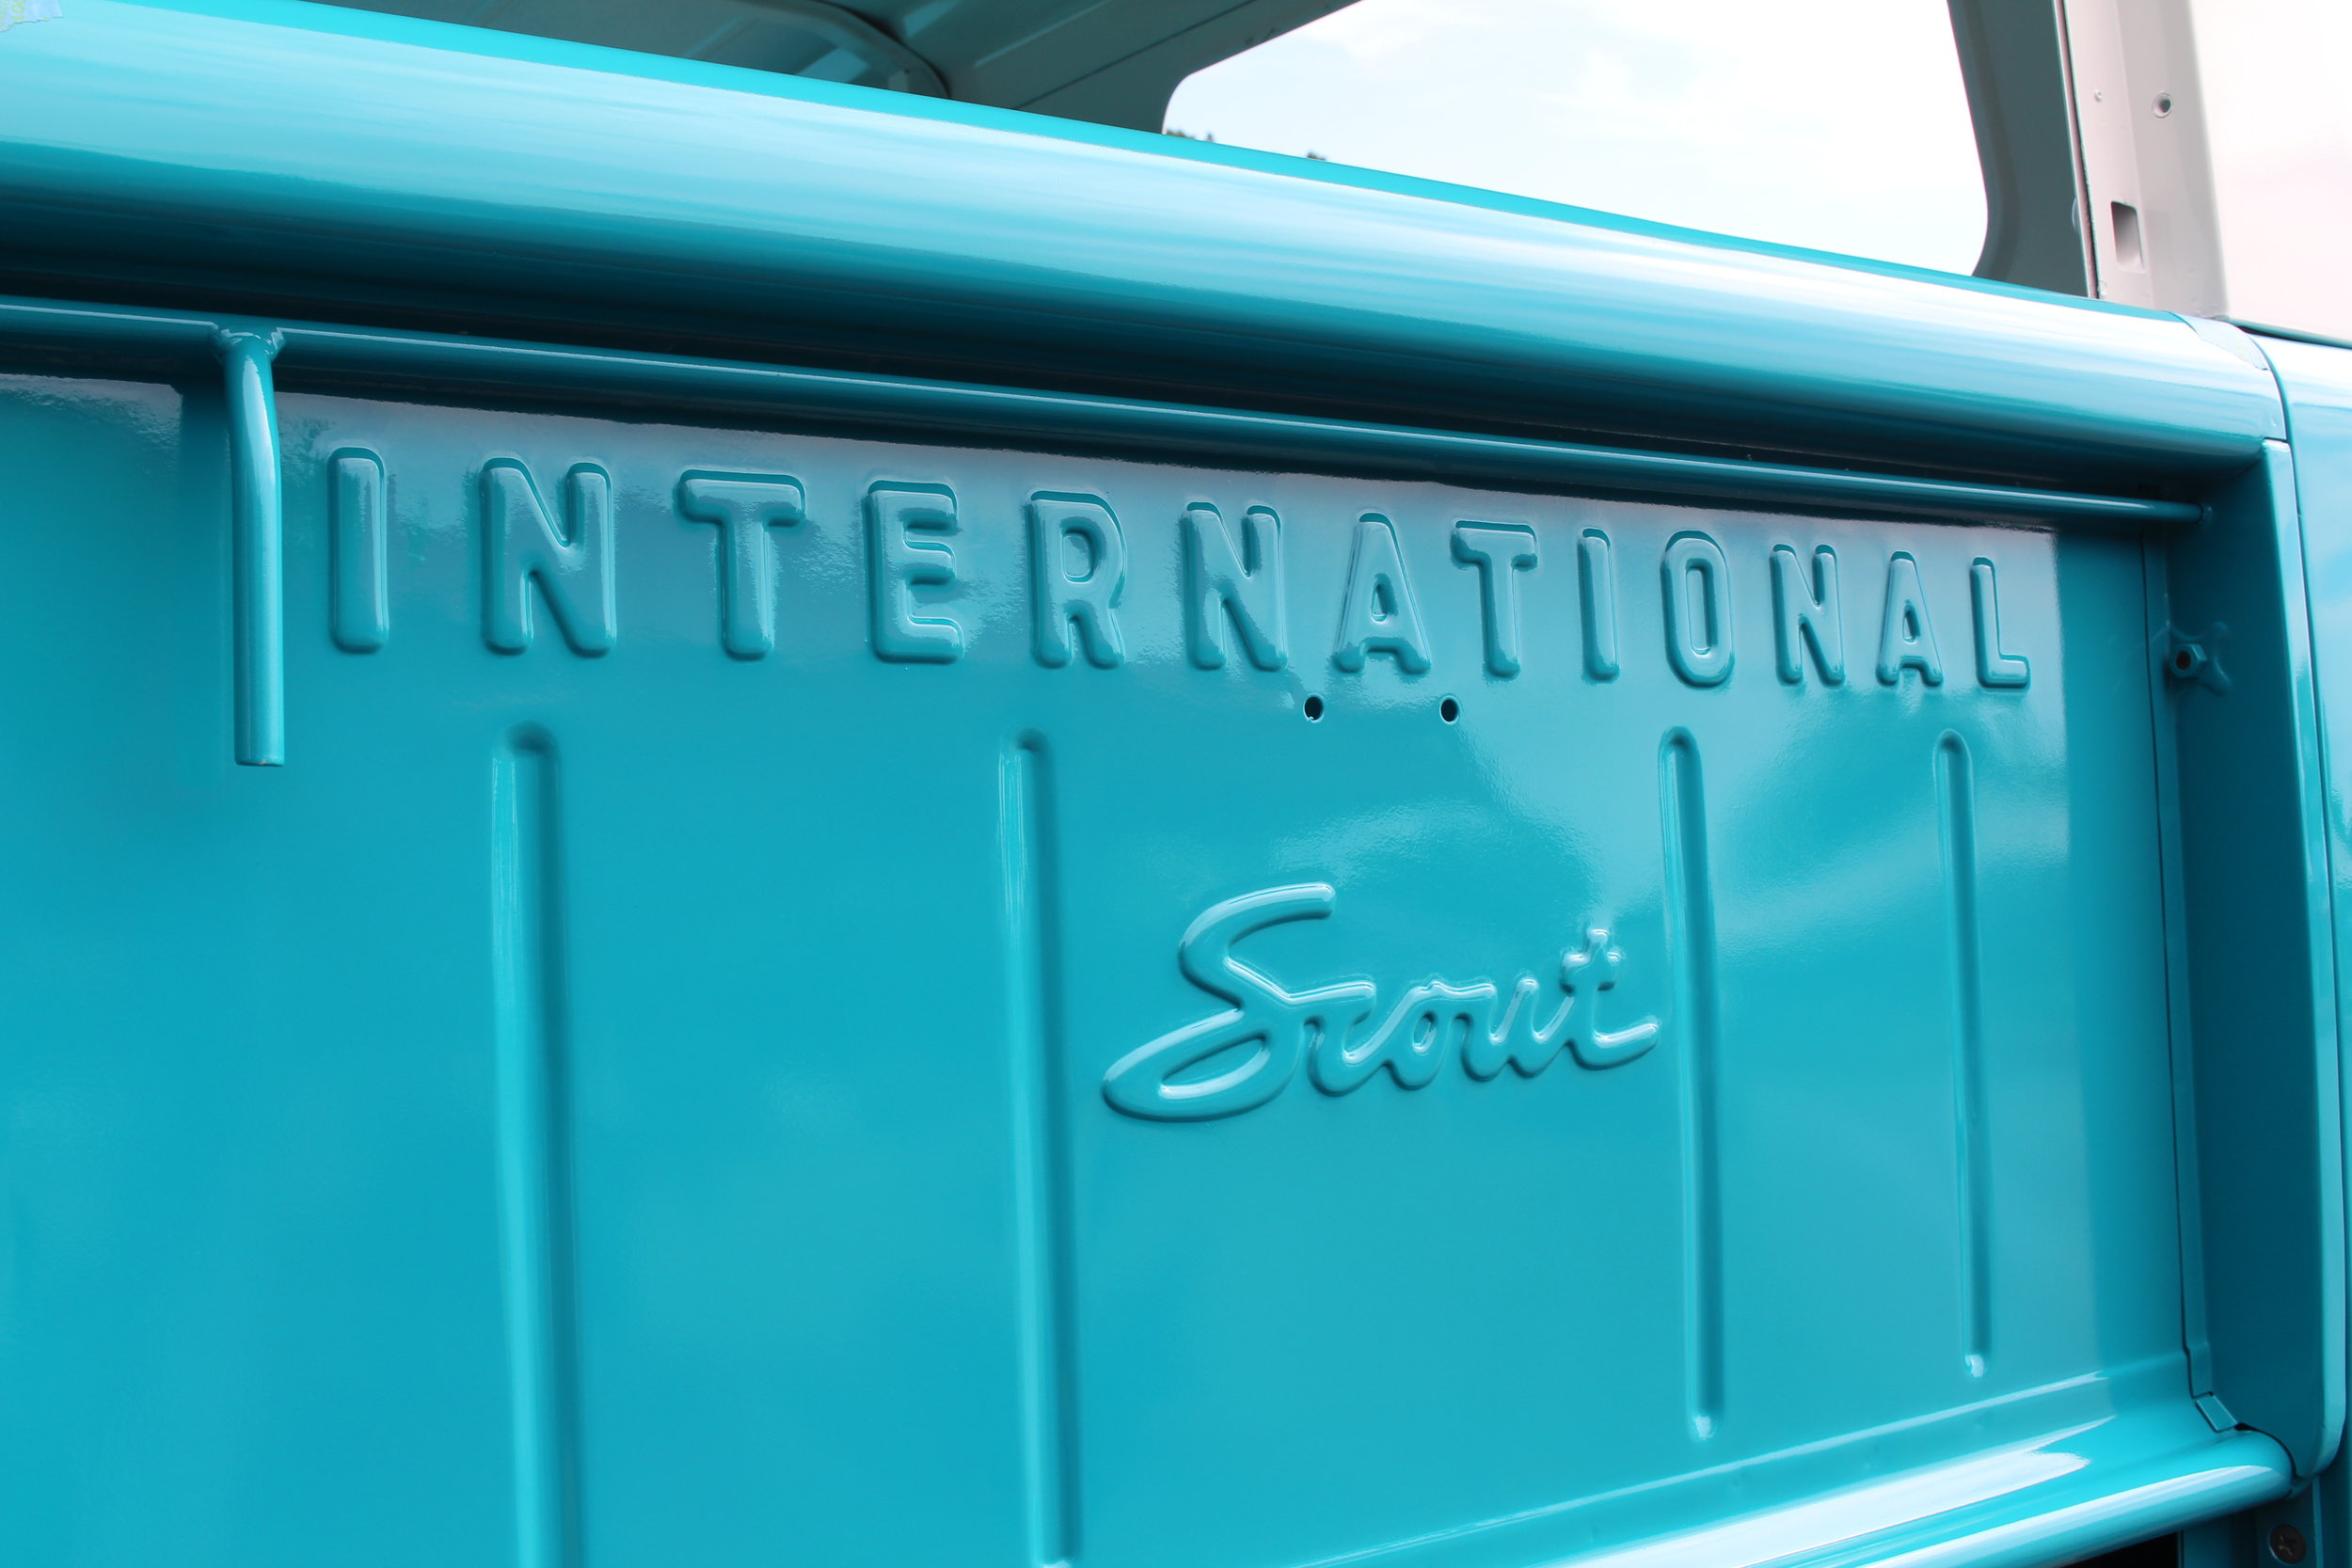 1968 International Harvester Scout